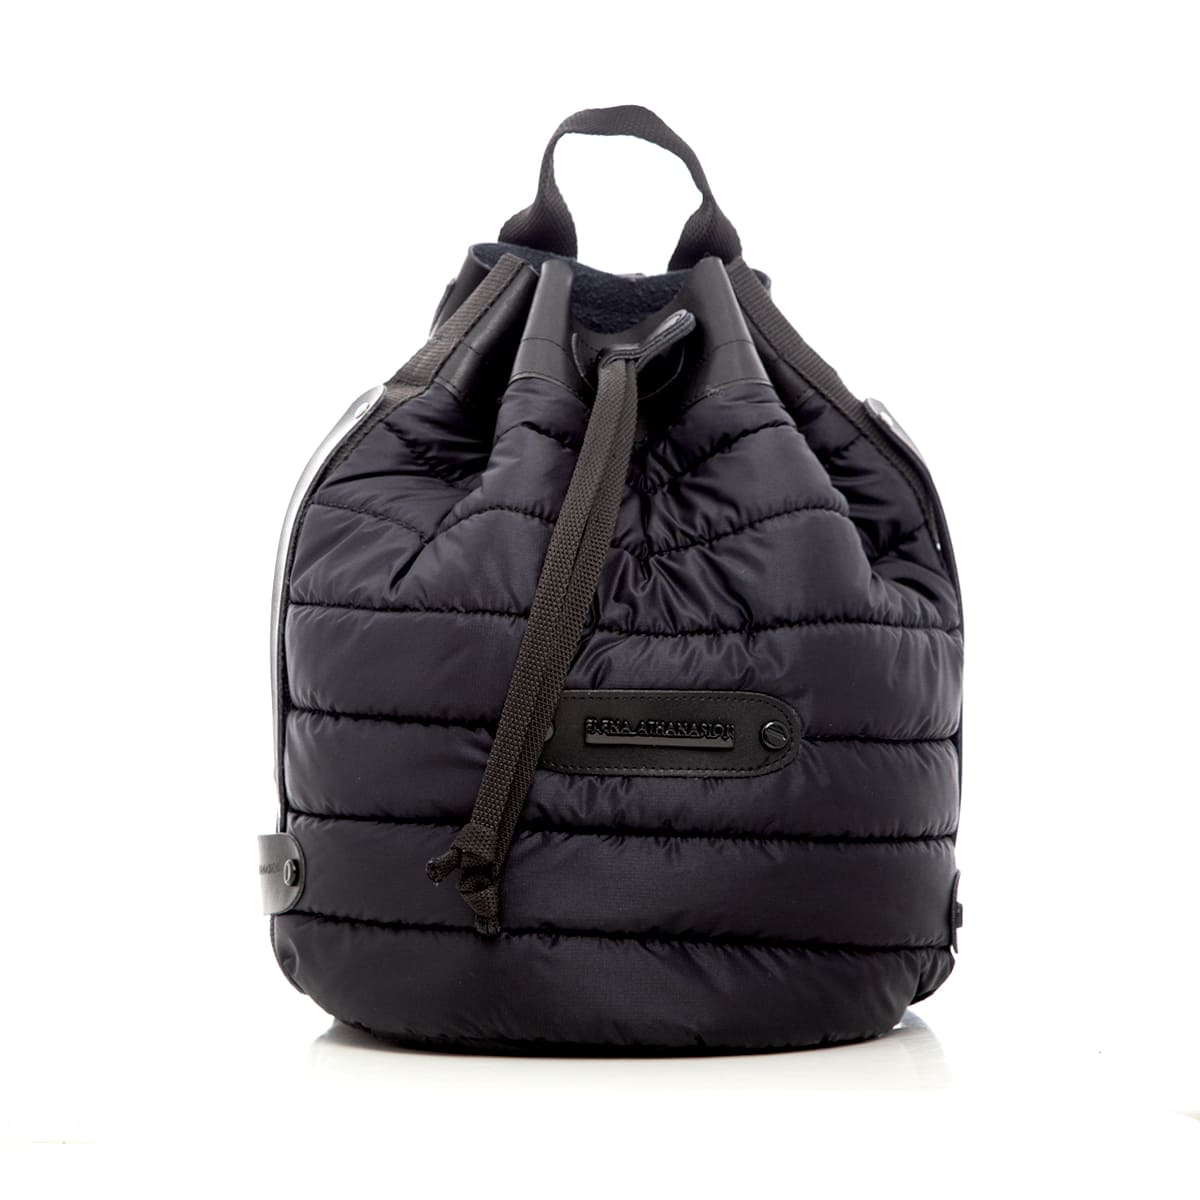 Puffer Backpack Black elena athanasou bags